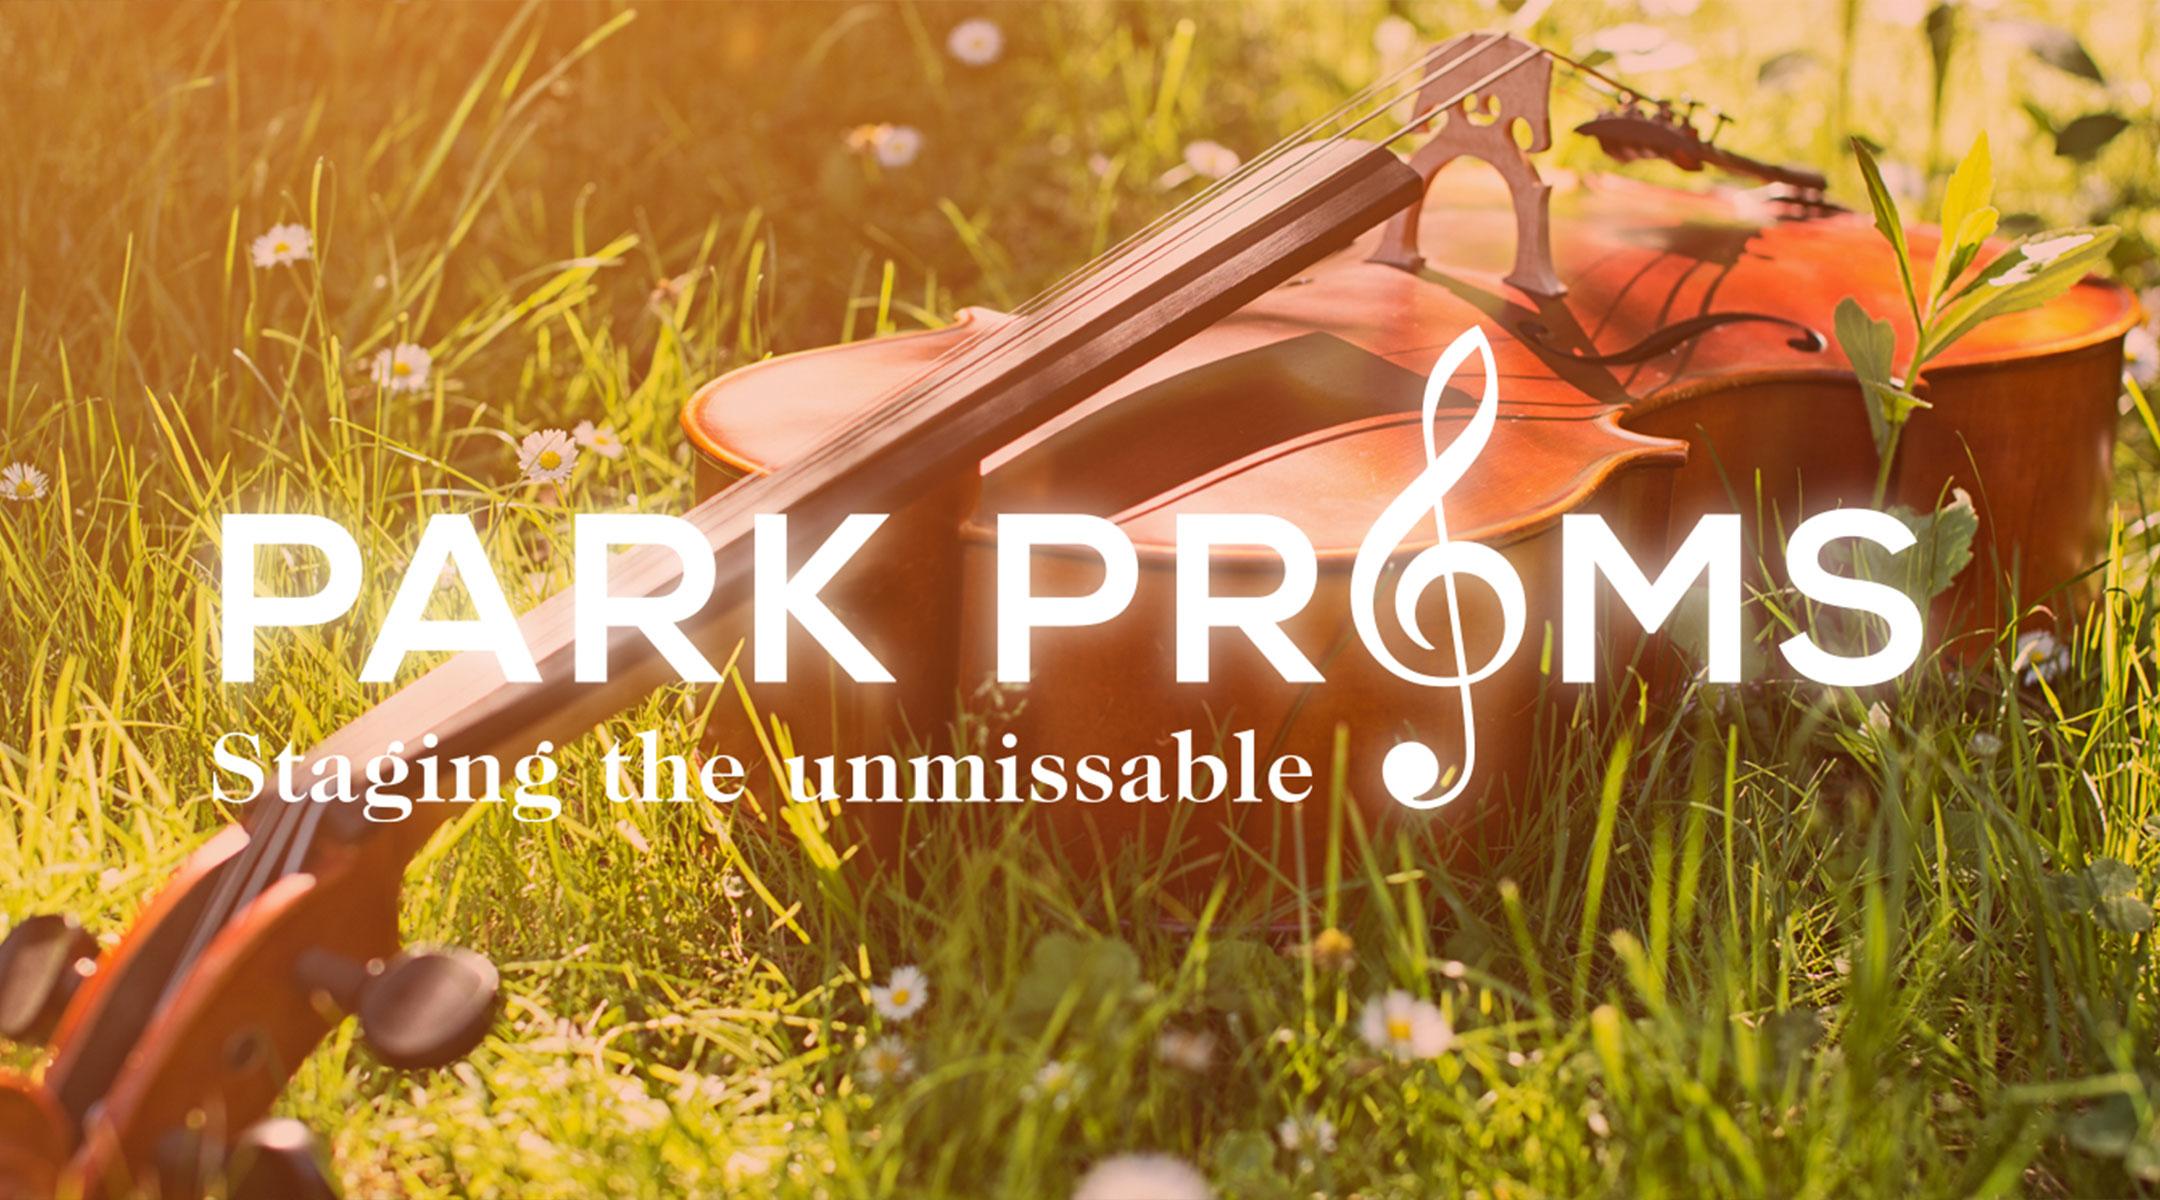 Park Proms - James Morrison + Pixie Lott + Scouting for Girls + Eliza & the Bear